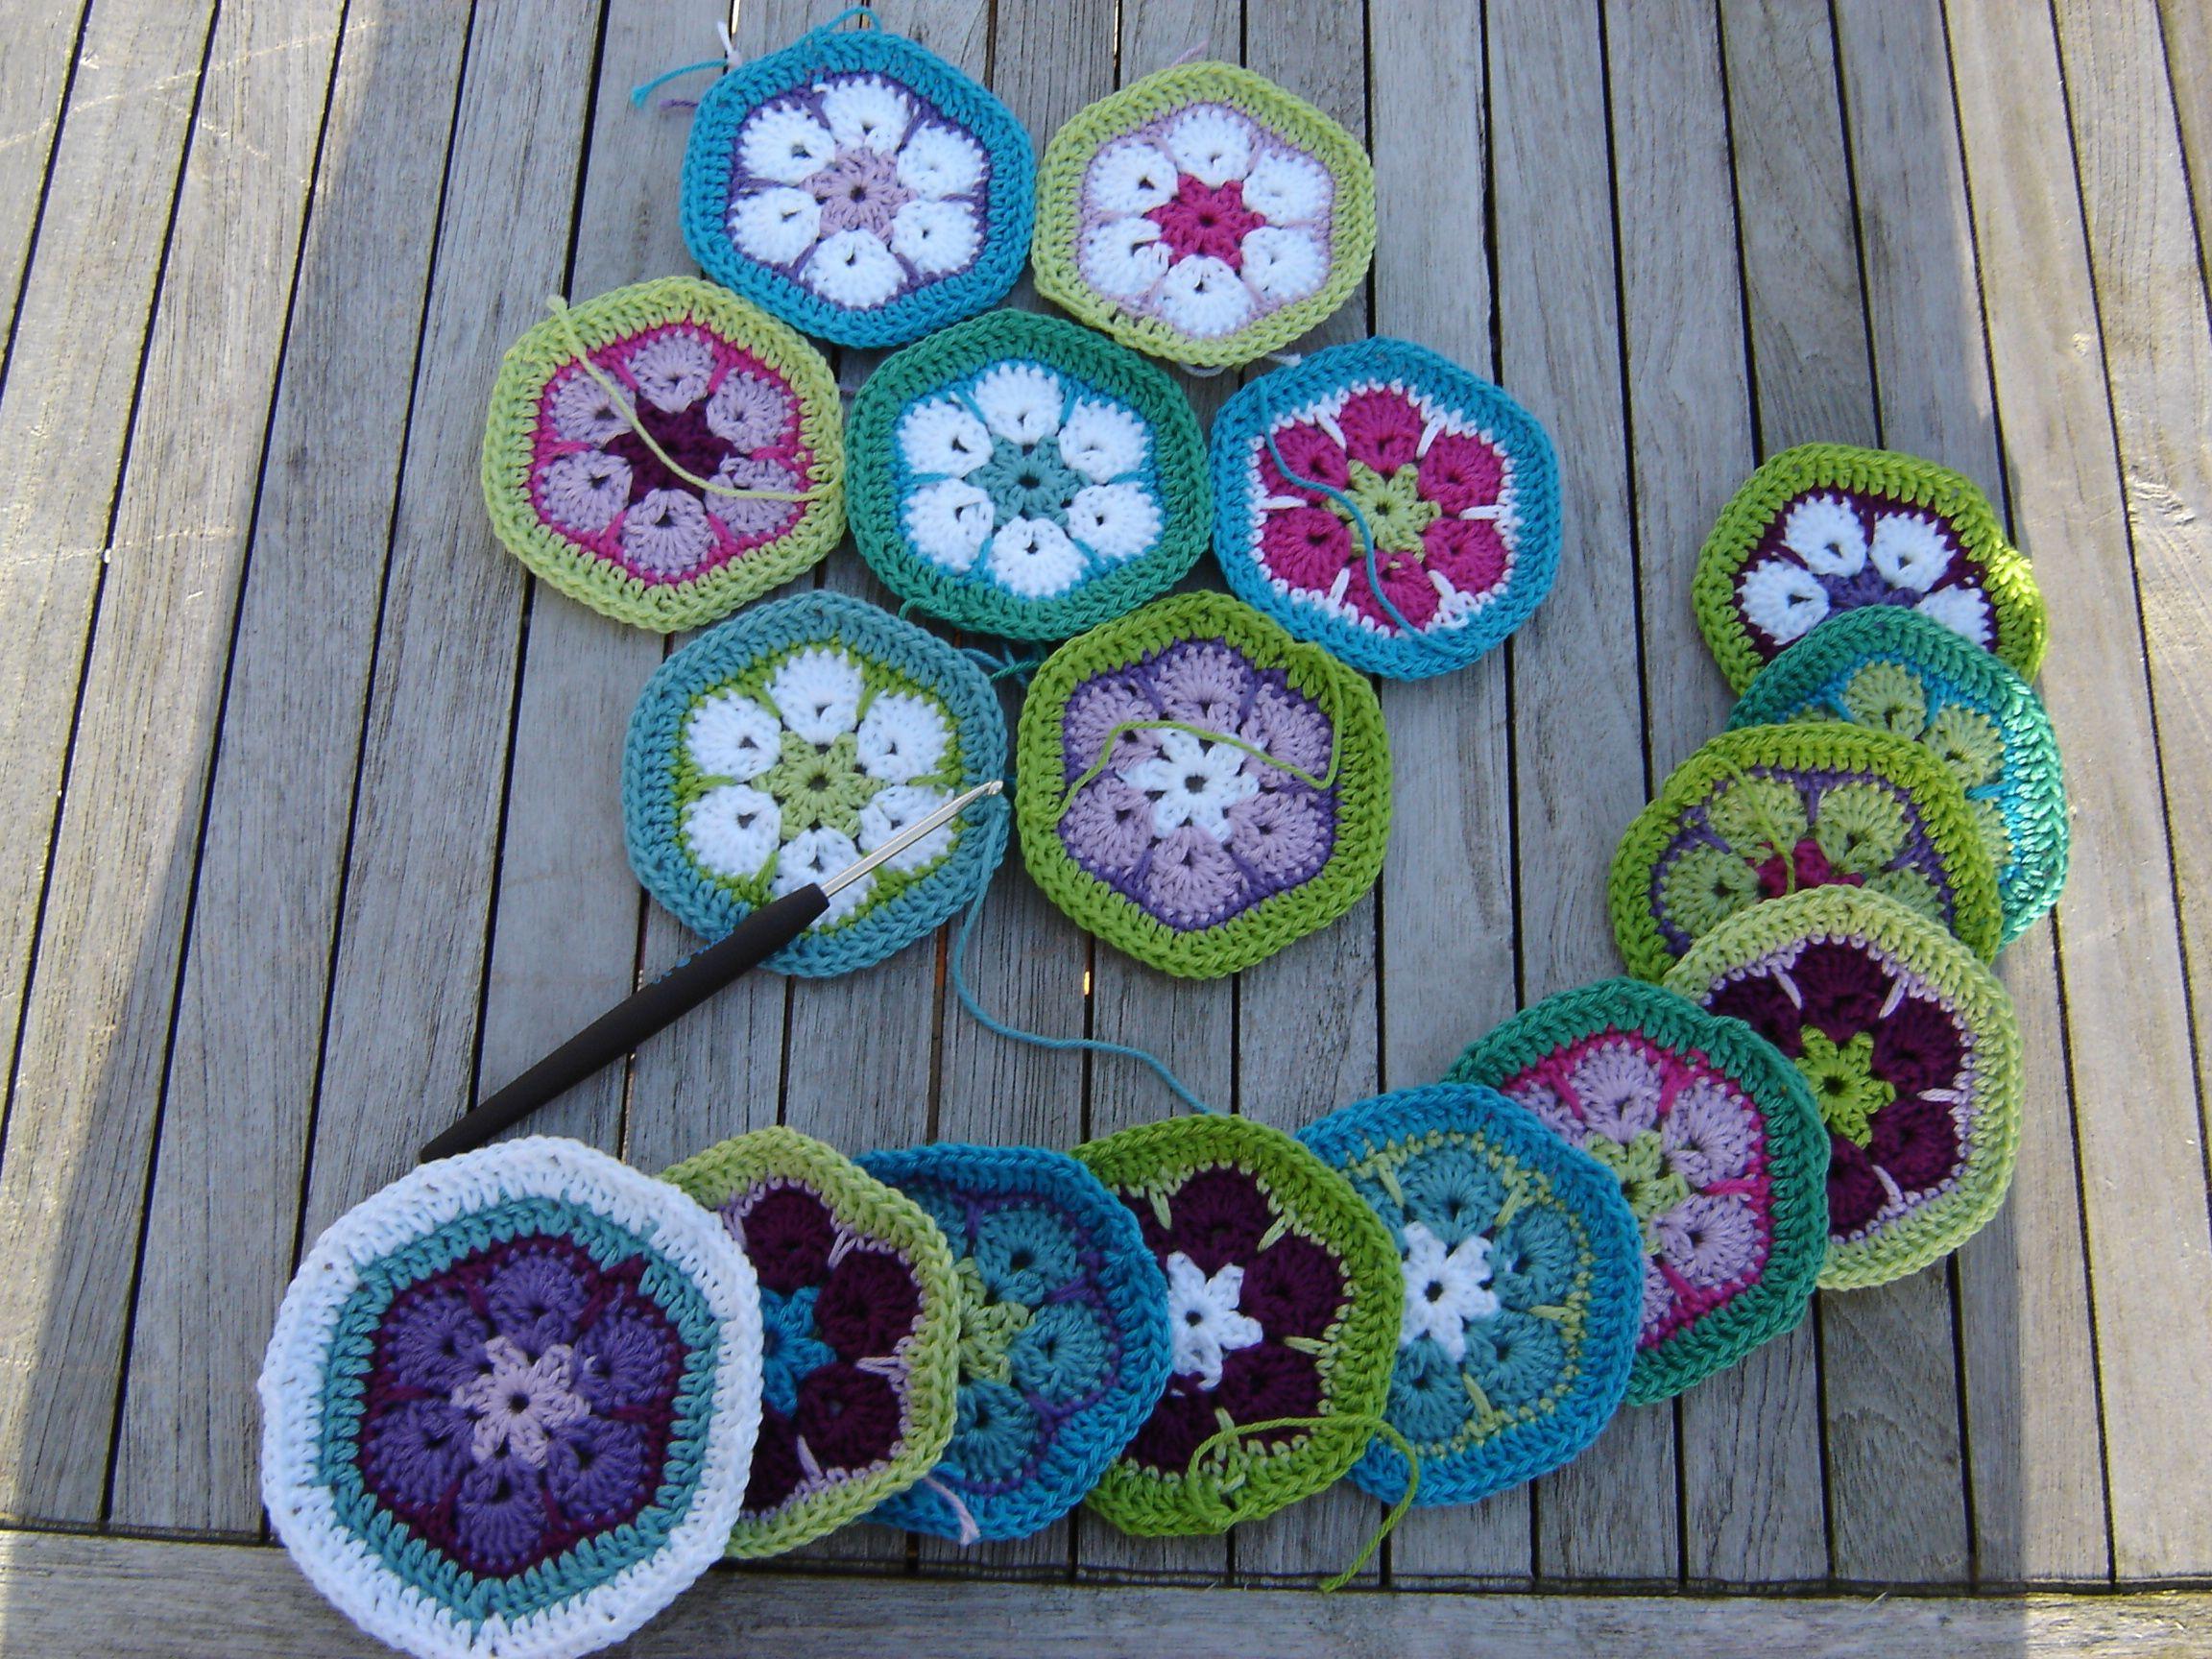 Enchanting Afrikanische Blume Häkelanleitungen Image - Decke ...